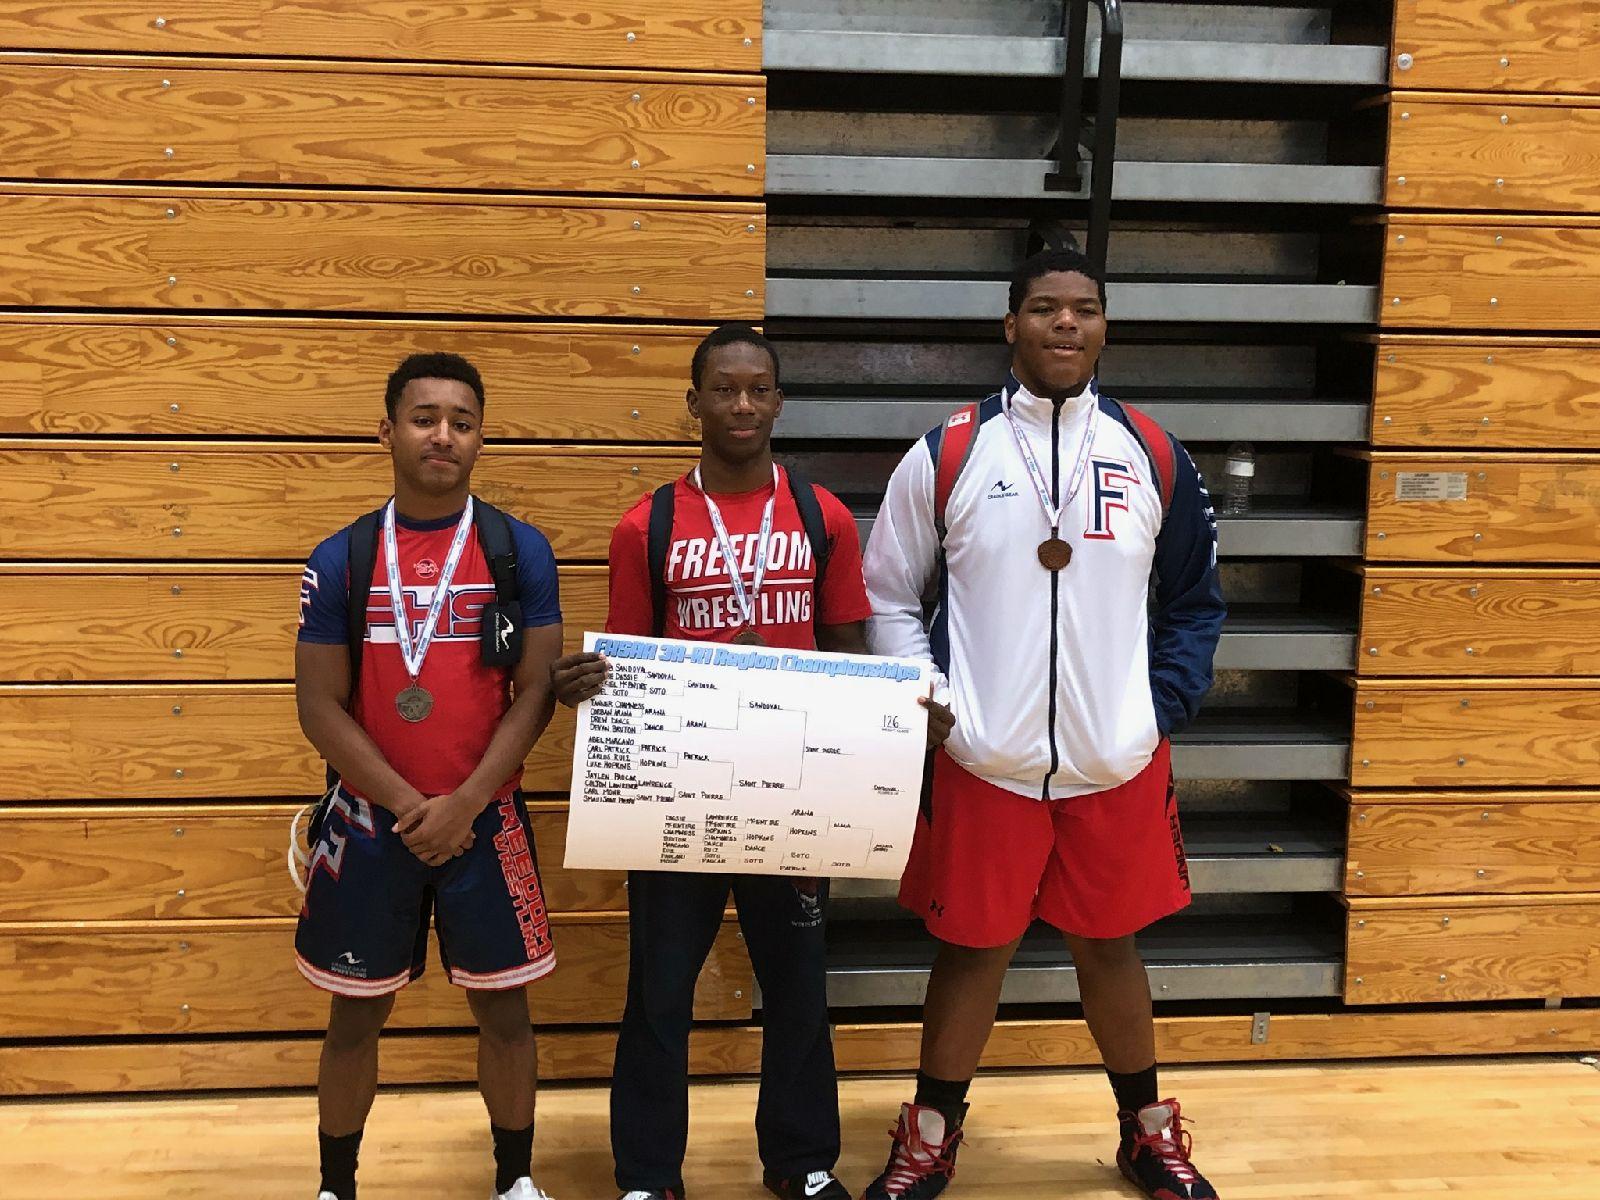 Boys Wrestling-3 athletes qualify for states!!!!